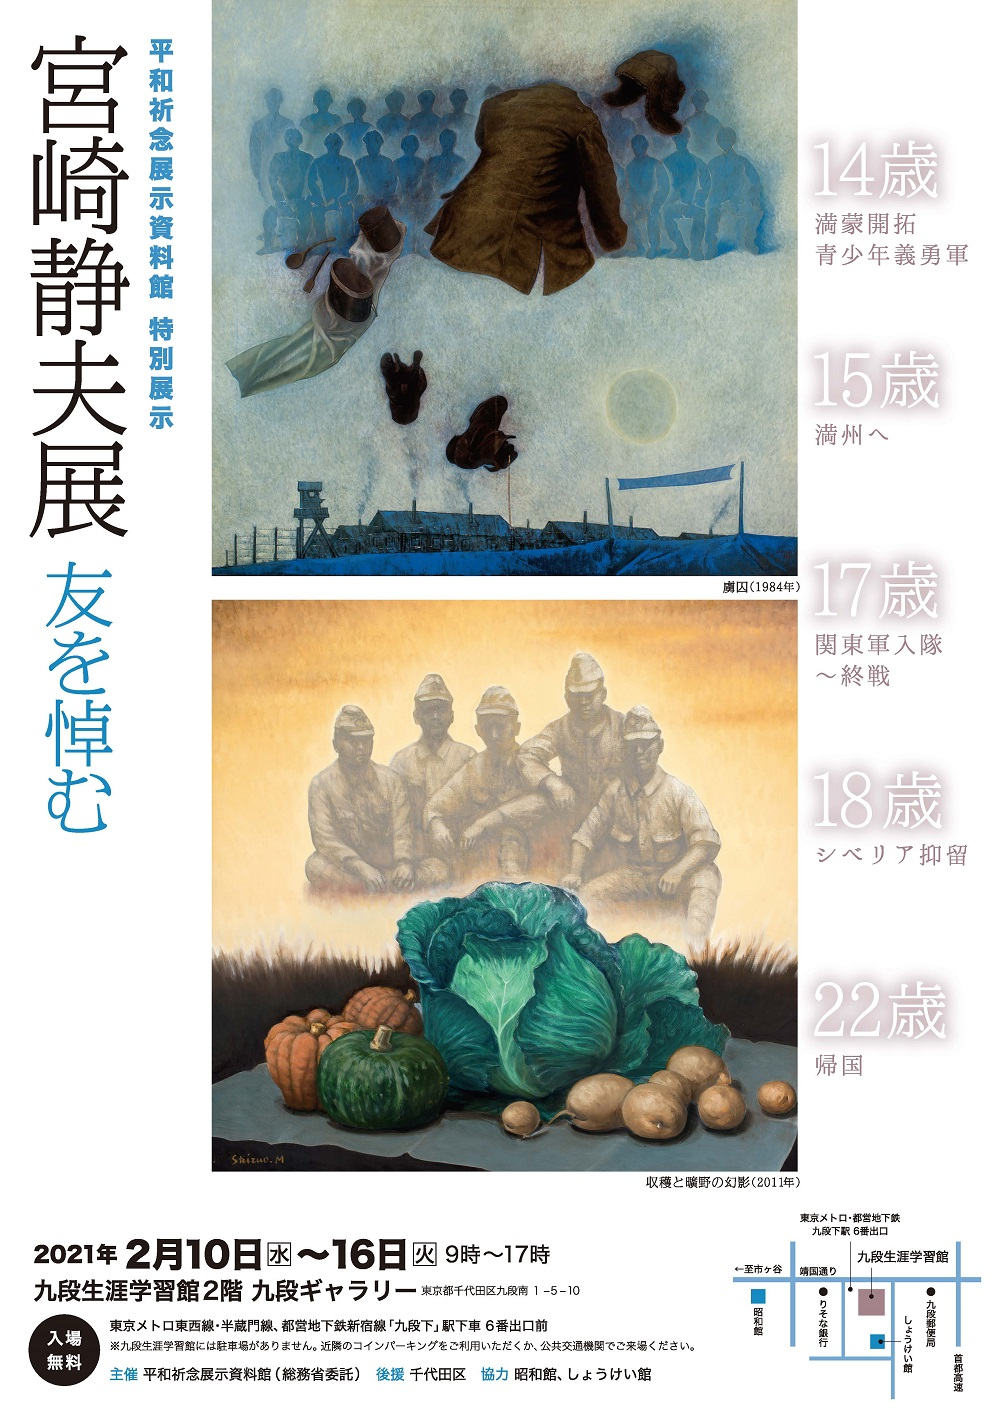 特別展示「宮崎静夫展 友を悼む」